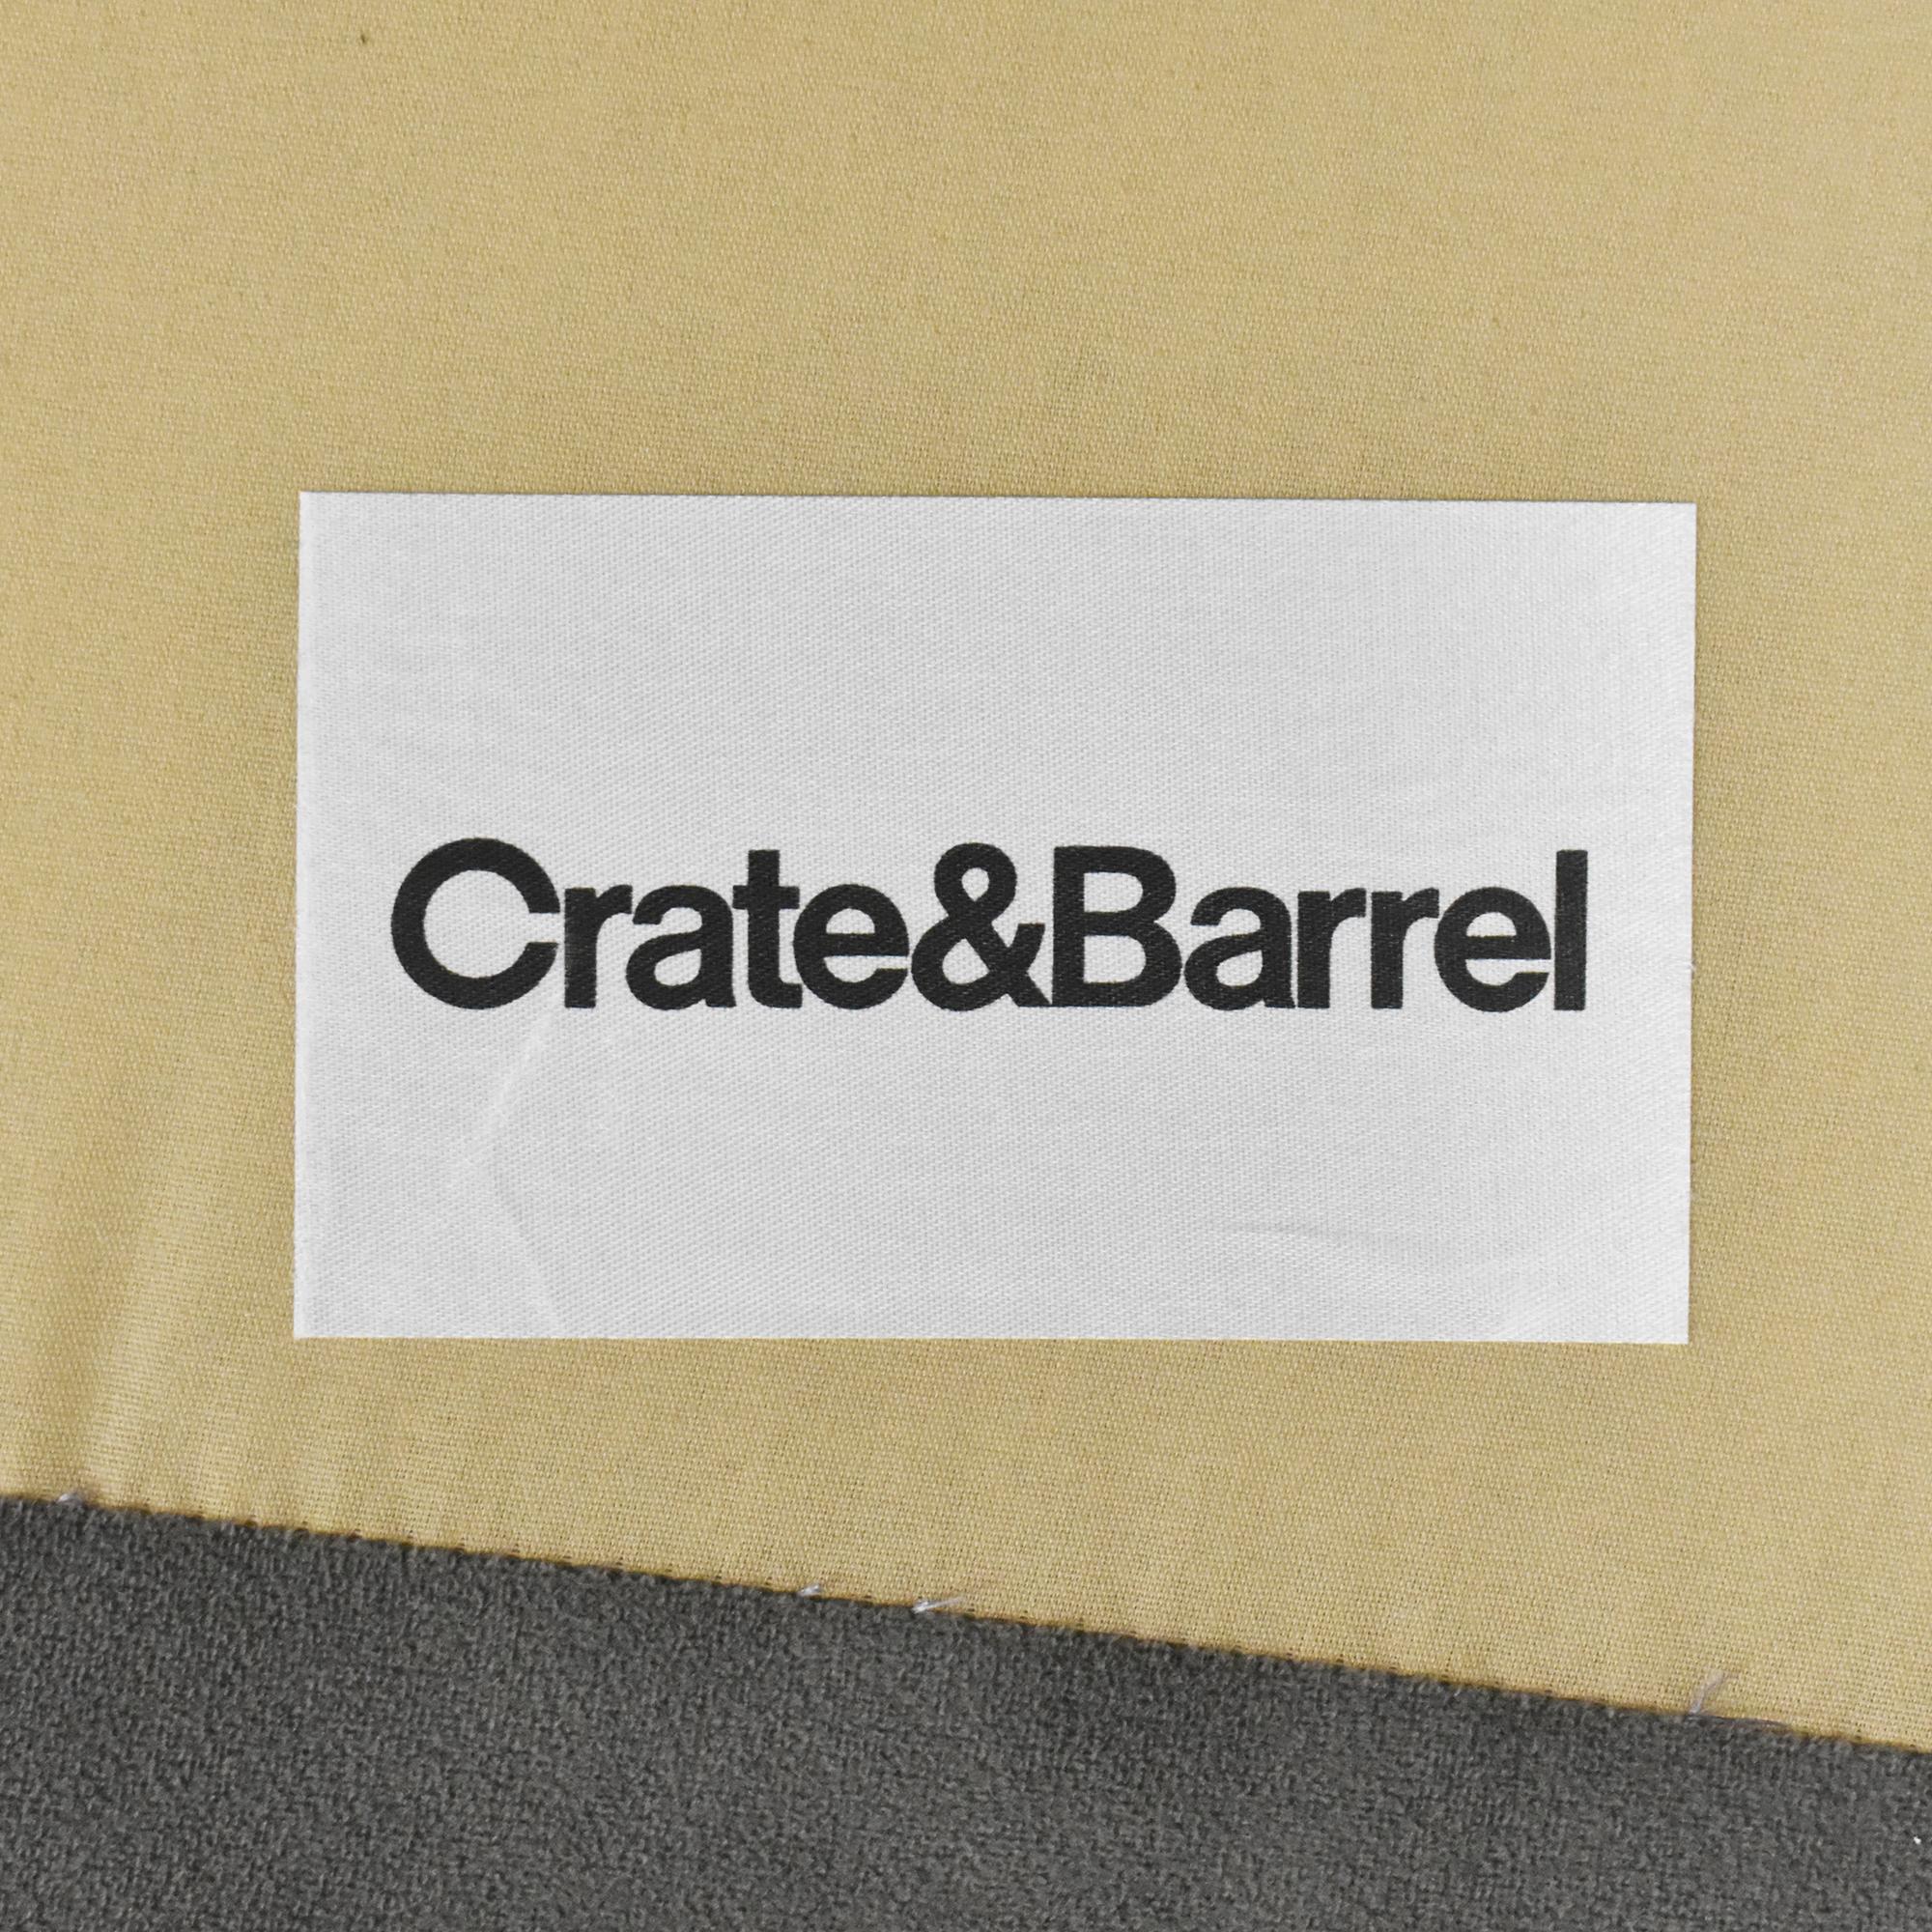 Crate & Barrel Crate & Barrel Lounge II Chaise Sectional Sofa ma